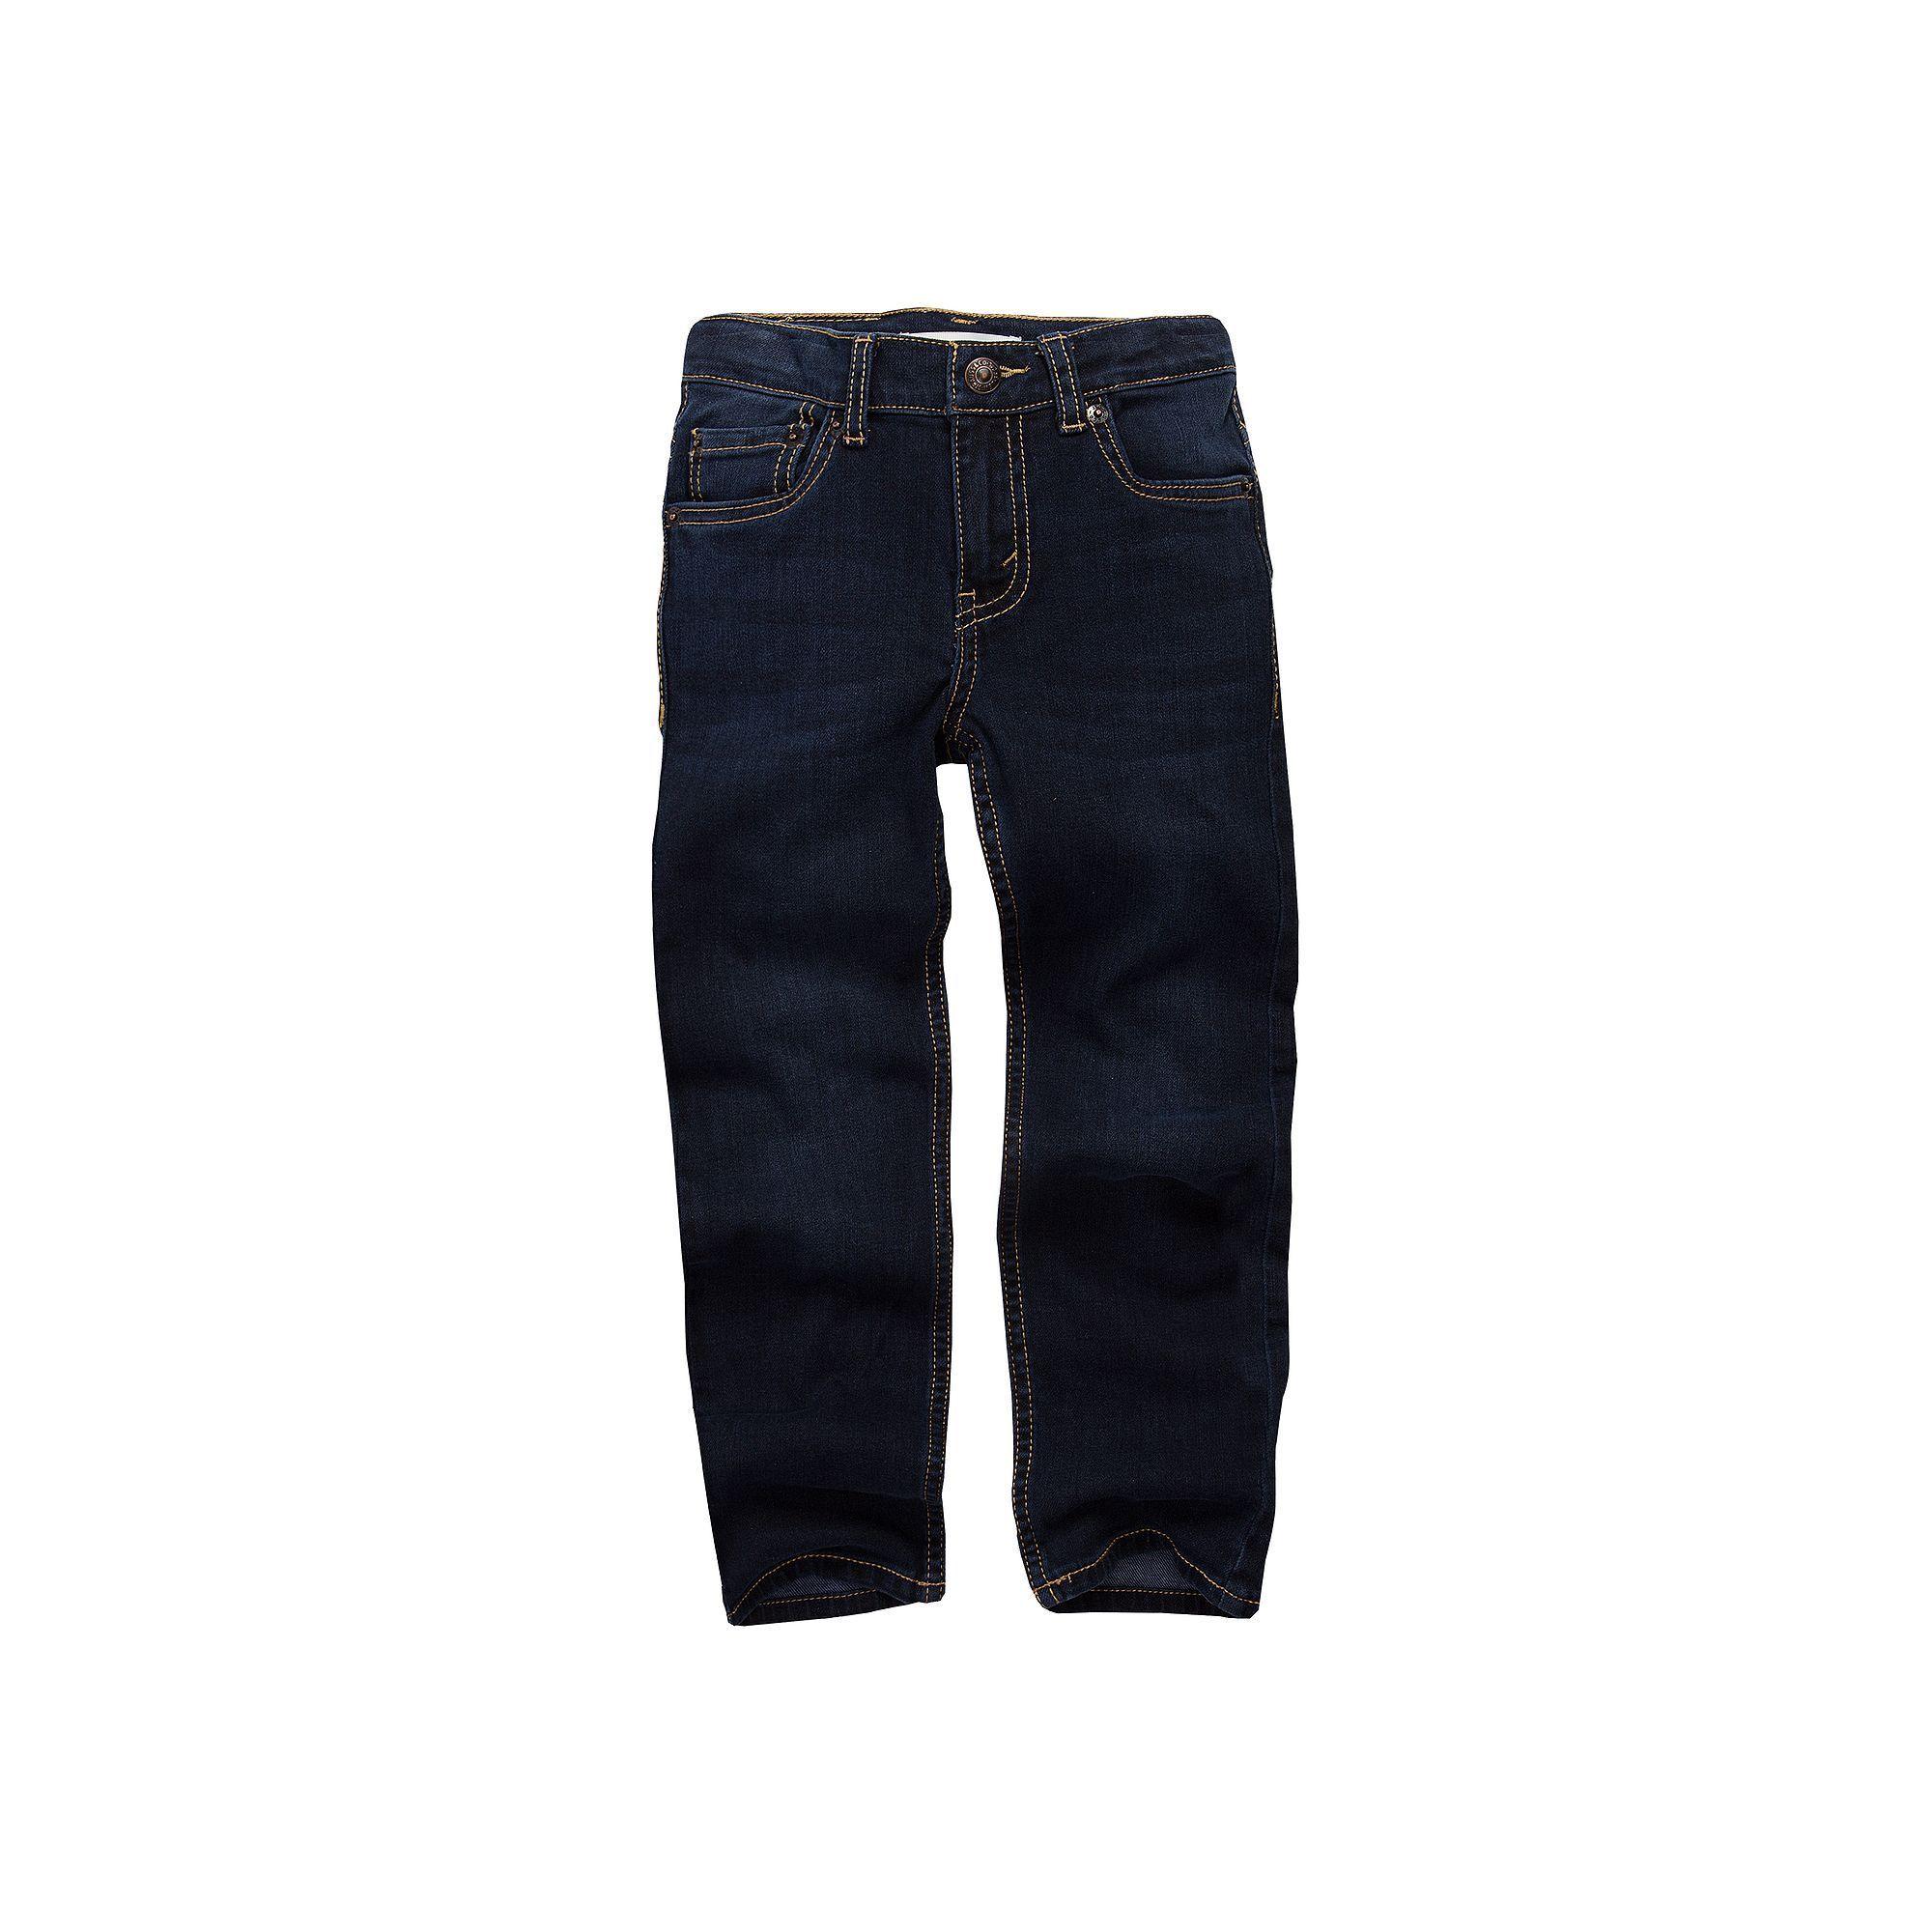 Boys 4-7x Levi's 510 Skinny Fit Jeans, Size: 7X, Dark Blue